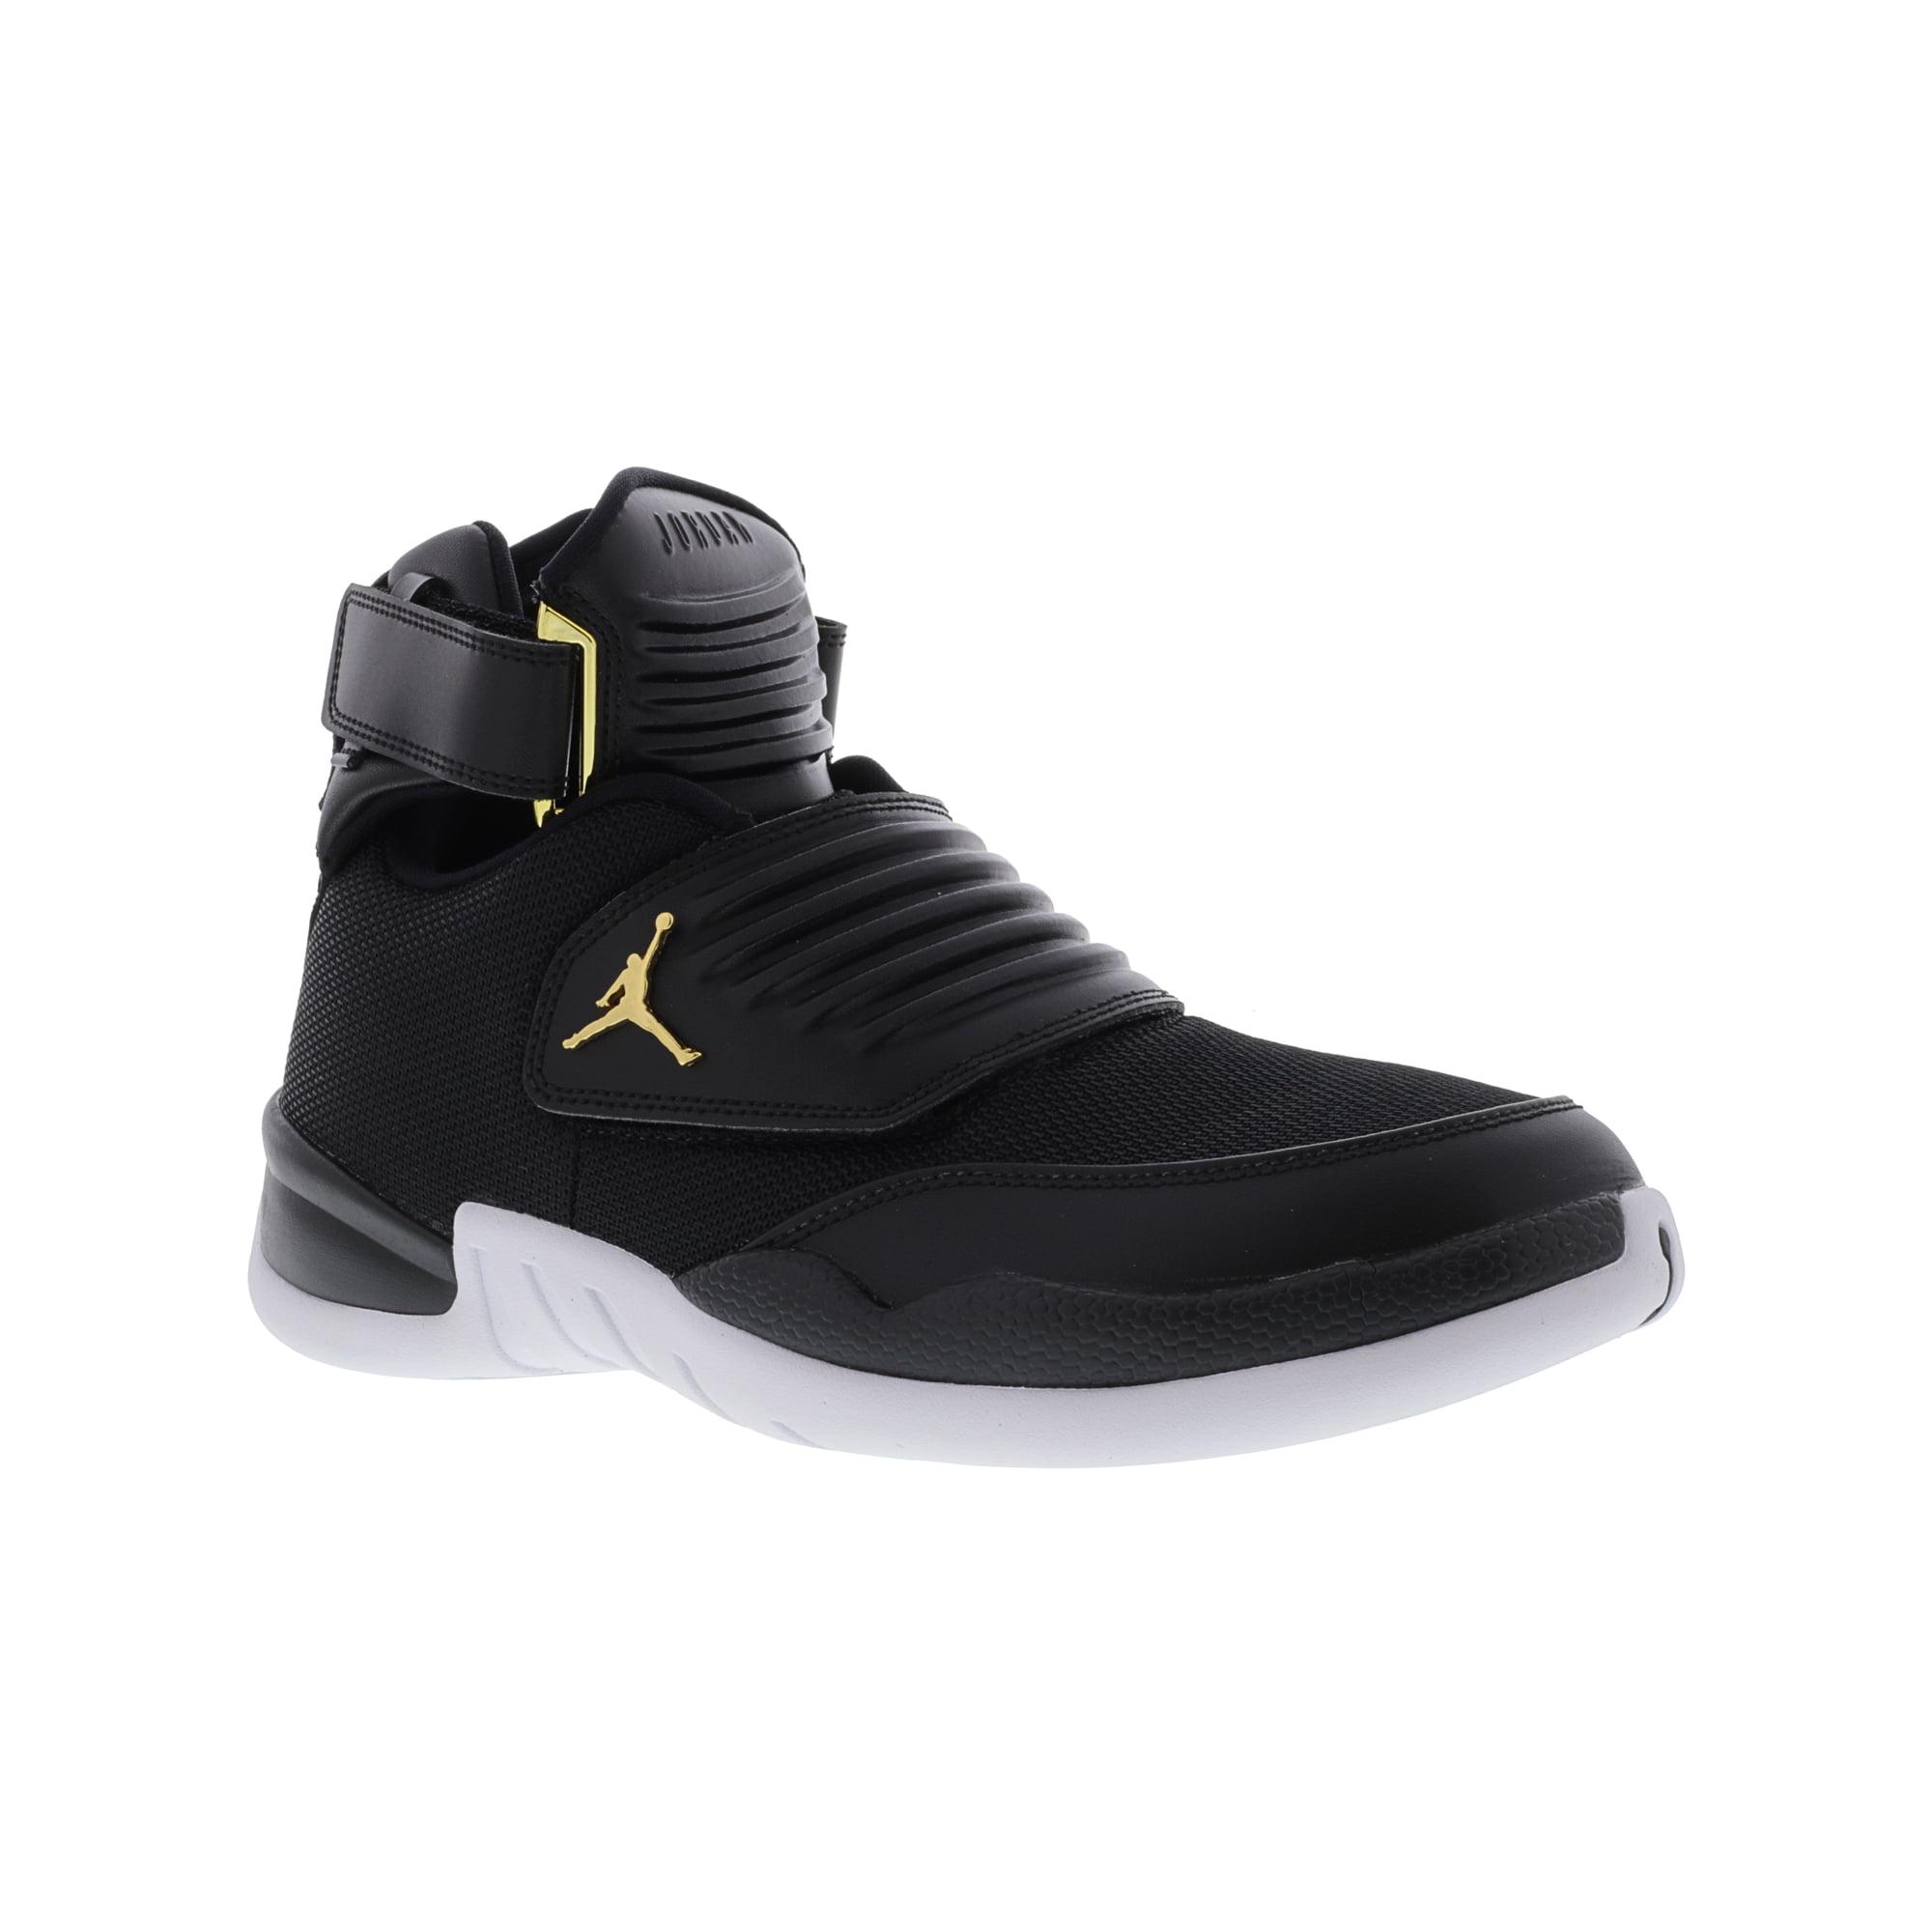 promo code 13a23 9b704 Nike Men s Jordan Generation 23 Black   - White Ankle-High Basketball Shoe  9.5M   Walmart Canada